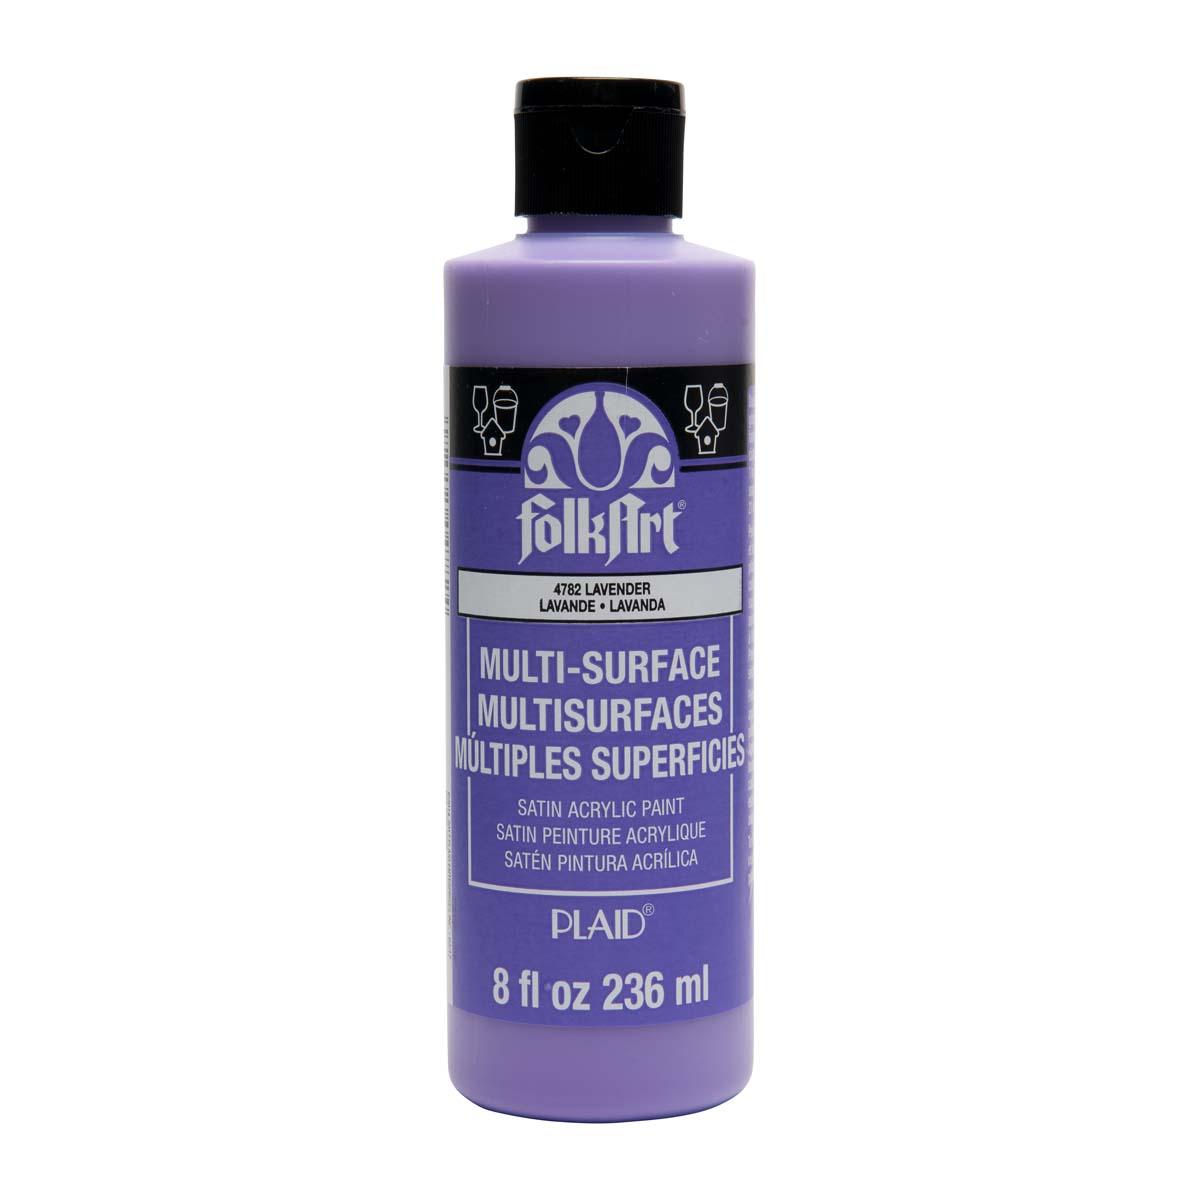 FolkArt ® Multi-Surface Satin Acrylic Paints - Lavender, 8 oz. - 4782